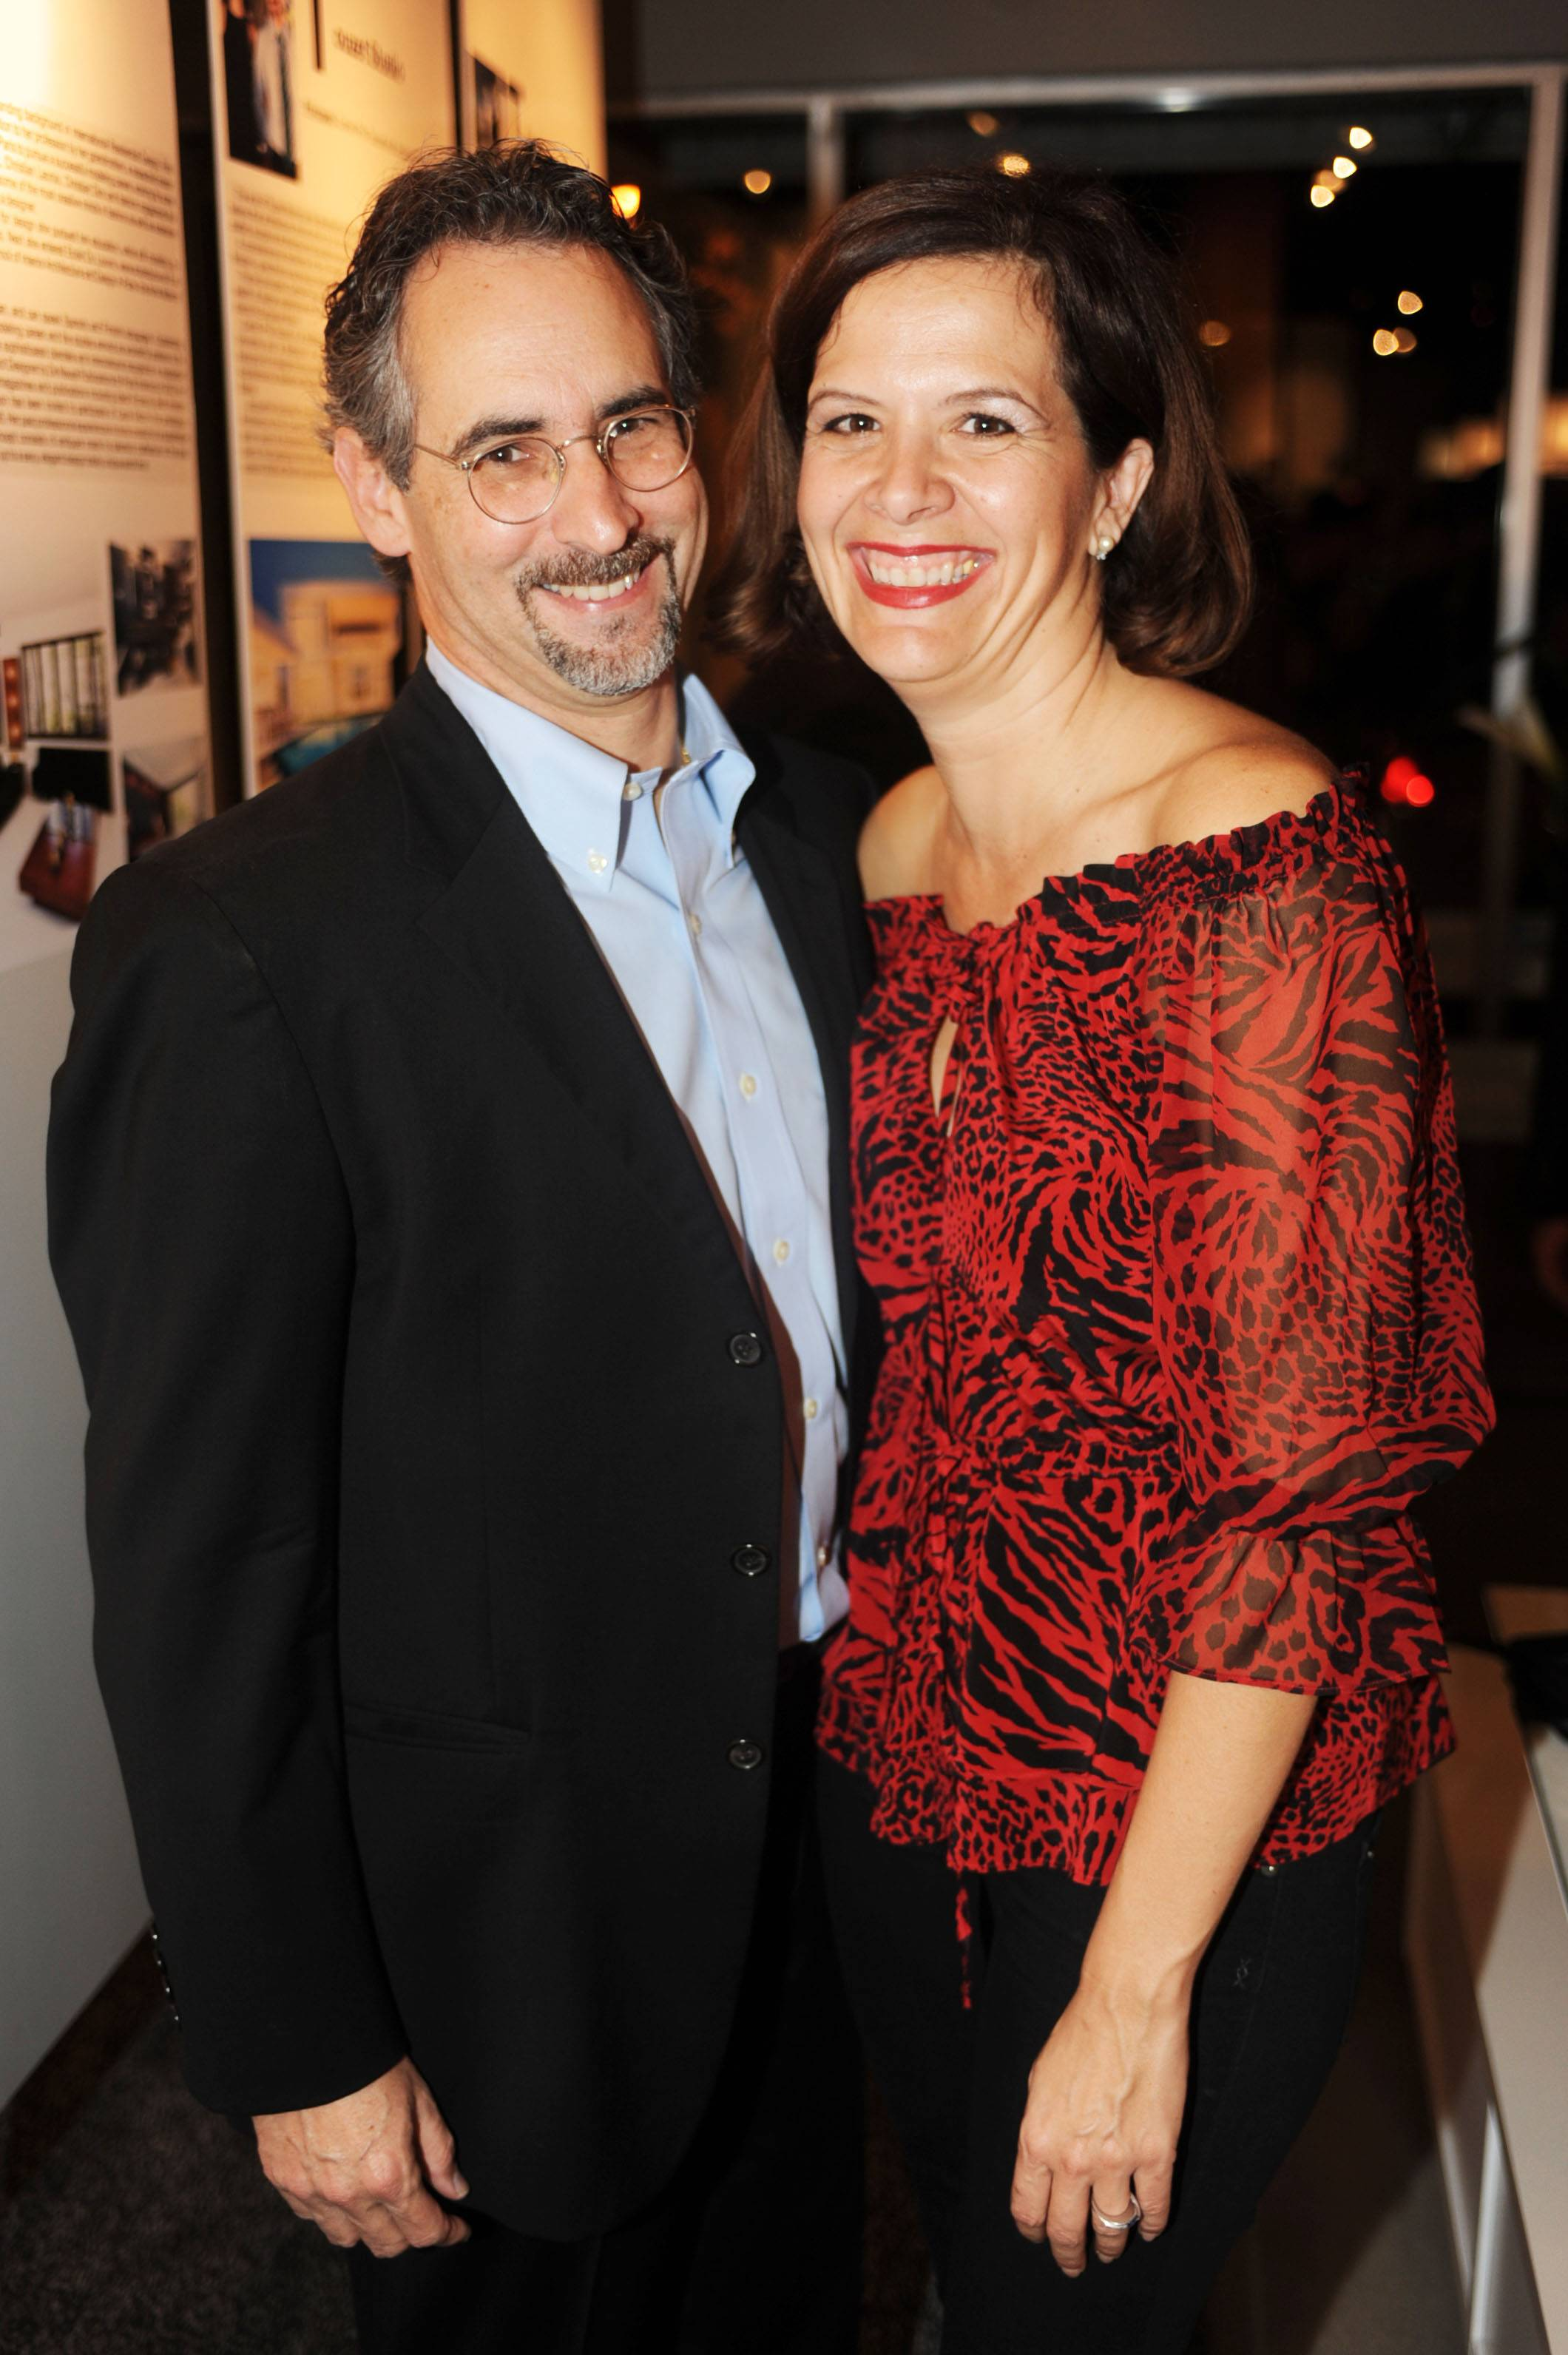 Carlos & Jacqueline Prio-Touzet